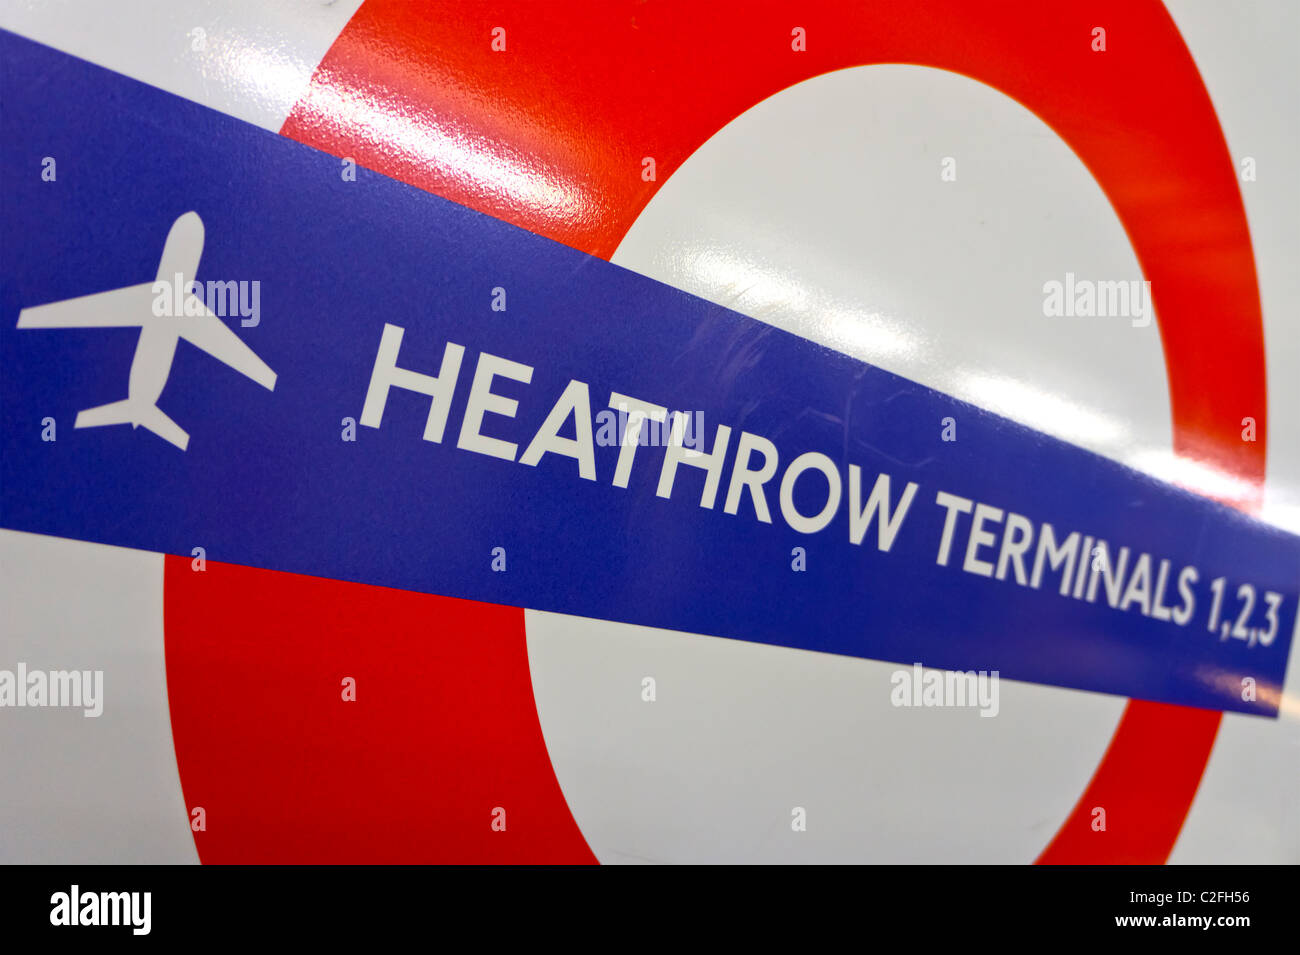 Heathrow Terminals 1 2 3 underground station sign - Stock Image